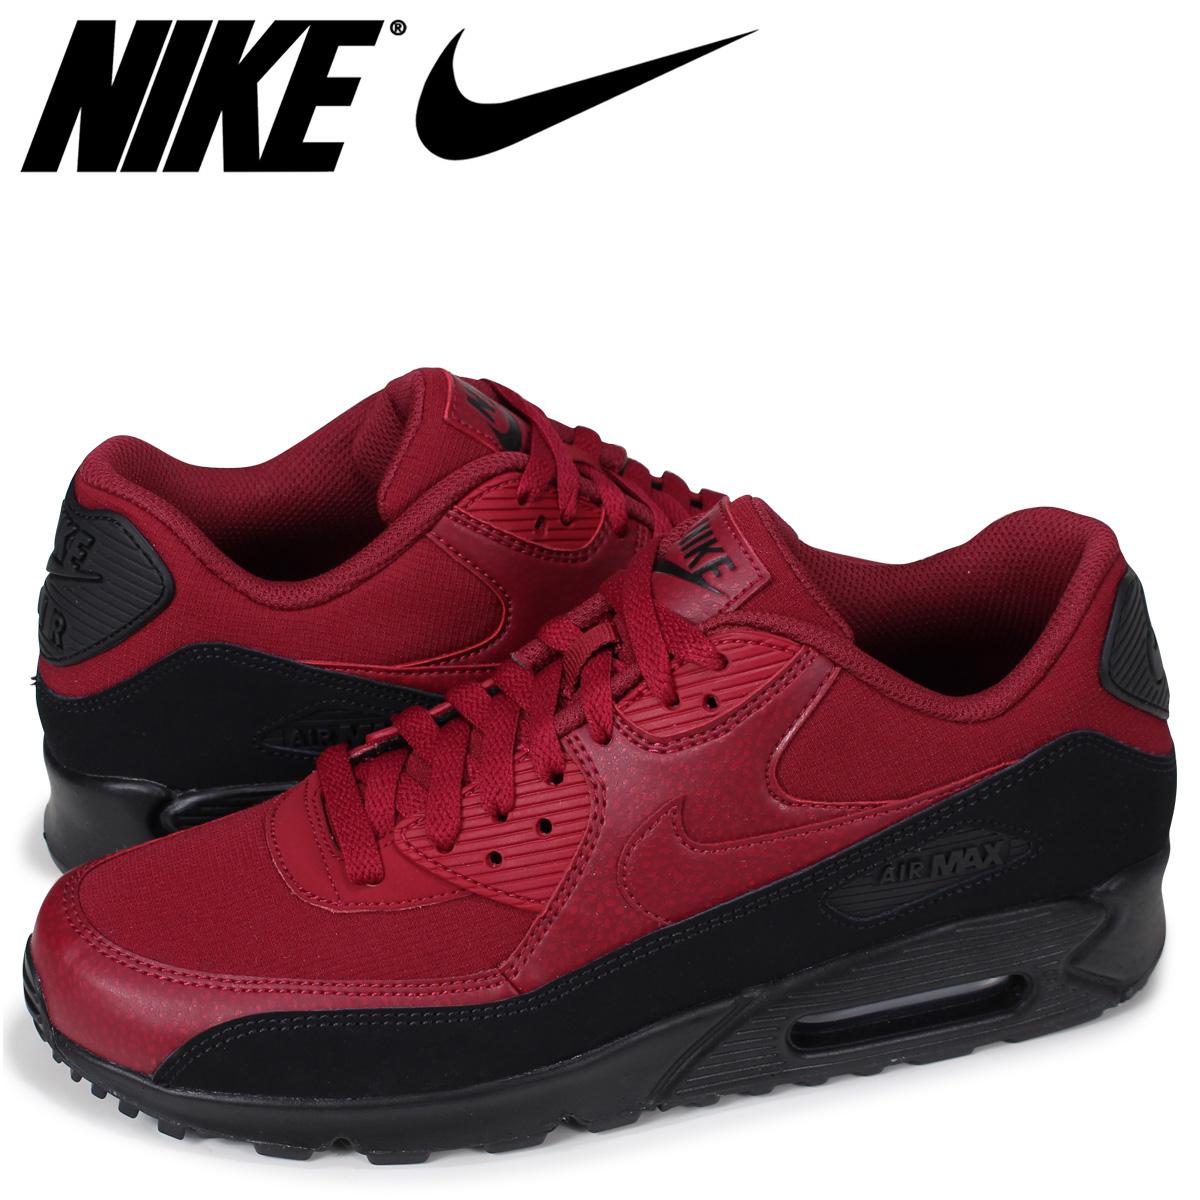 b457fc3470 SneaK Online Shop  Nike NIKE Air Max 90 essential sneakers men AIR ...